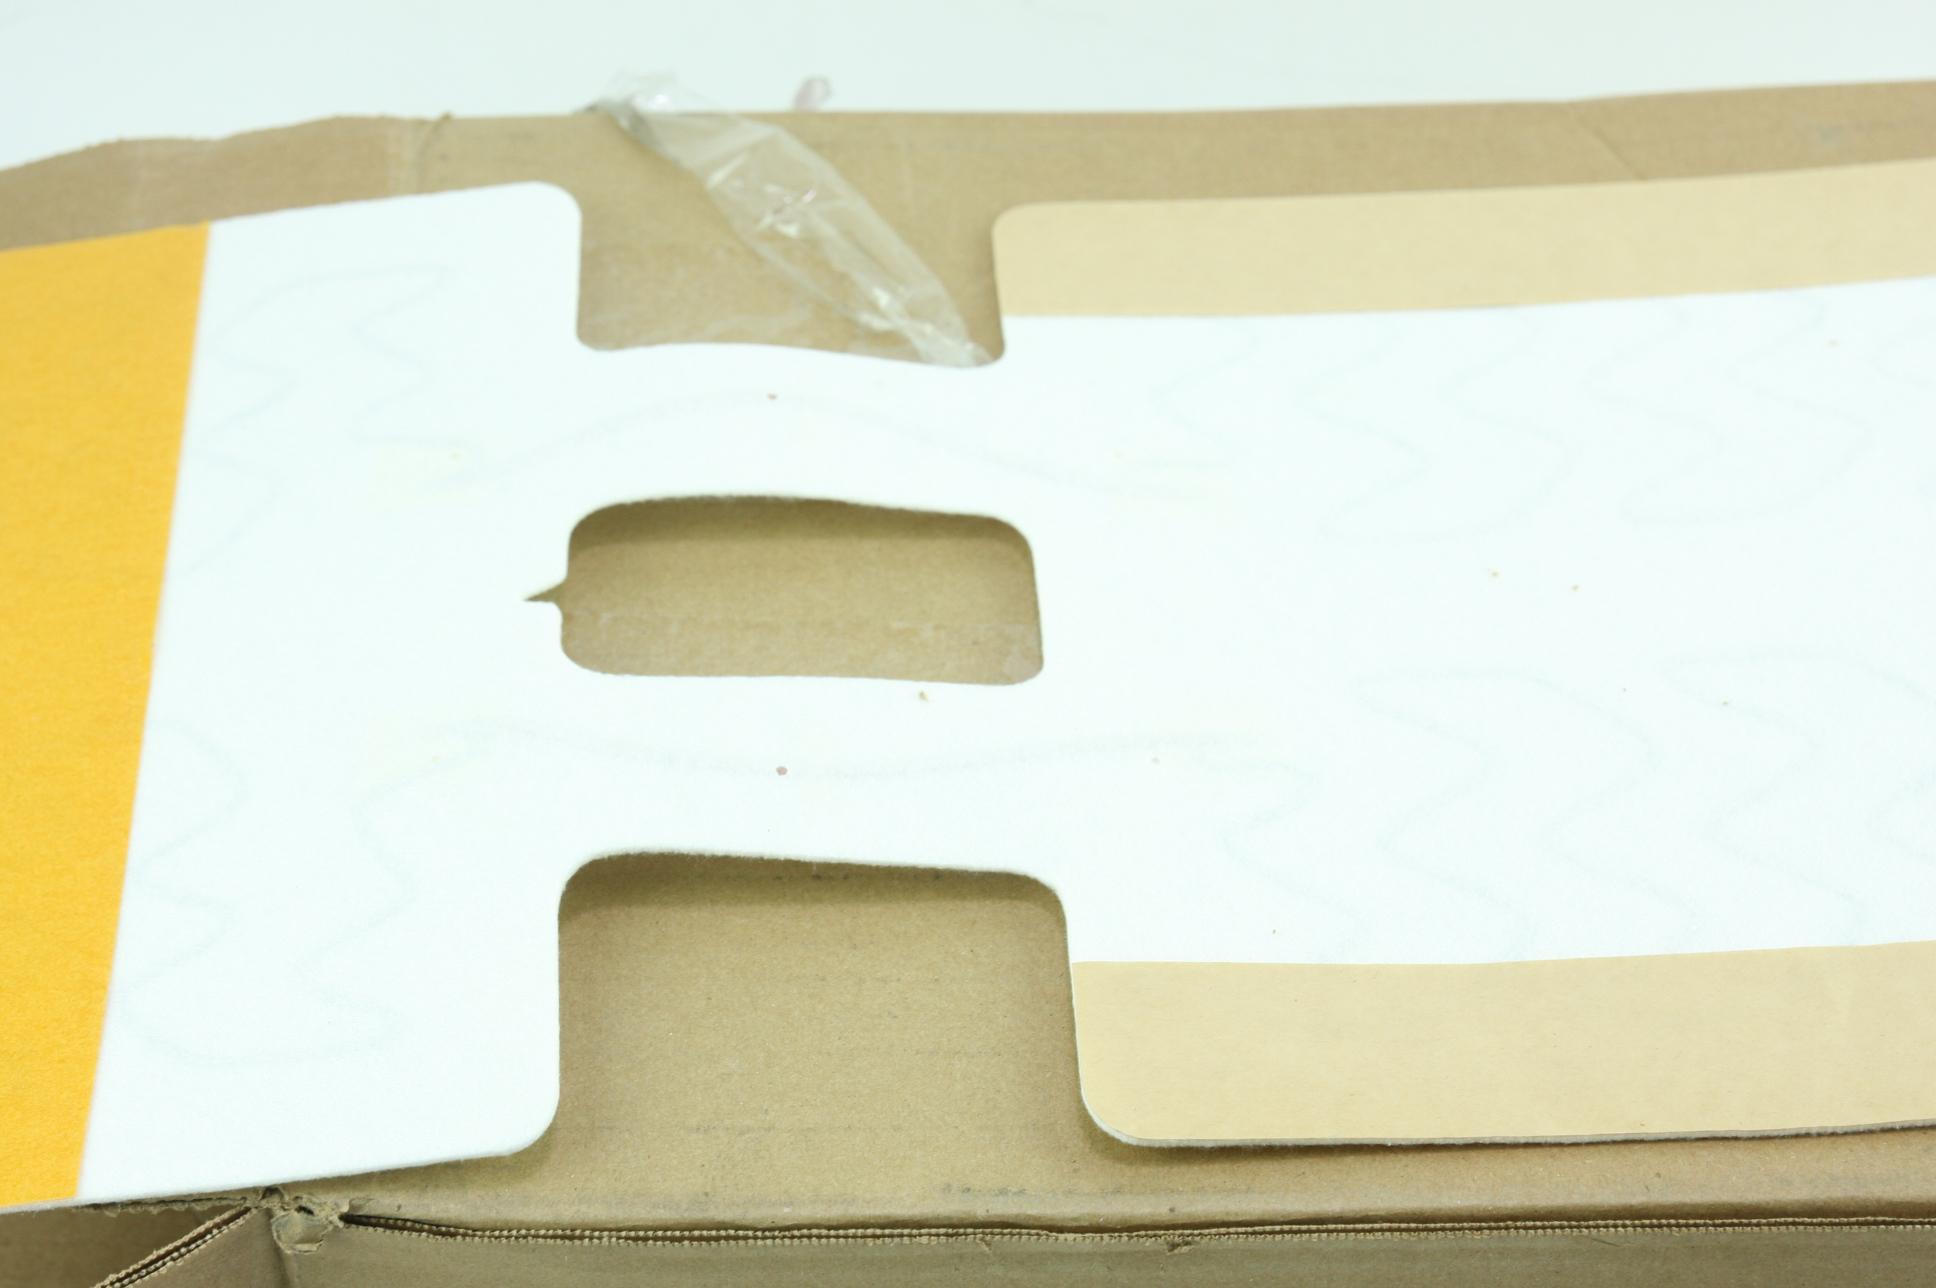 New Genuine OEM 88949407 GM Seat Heater Element Fast Free Shipping NIP - image 5